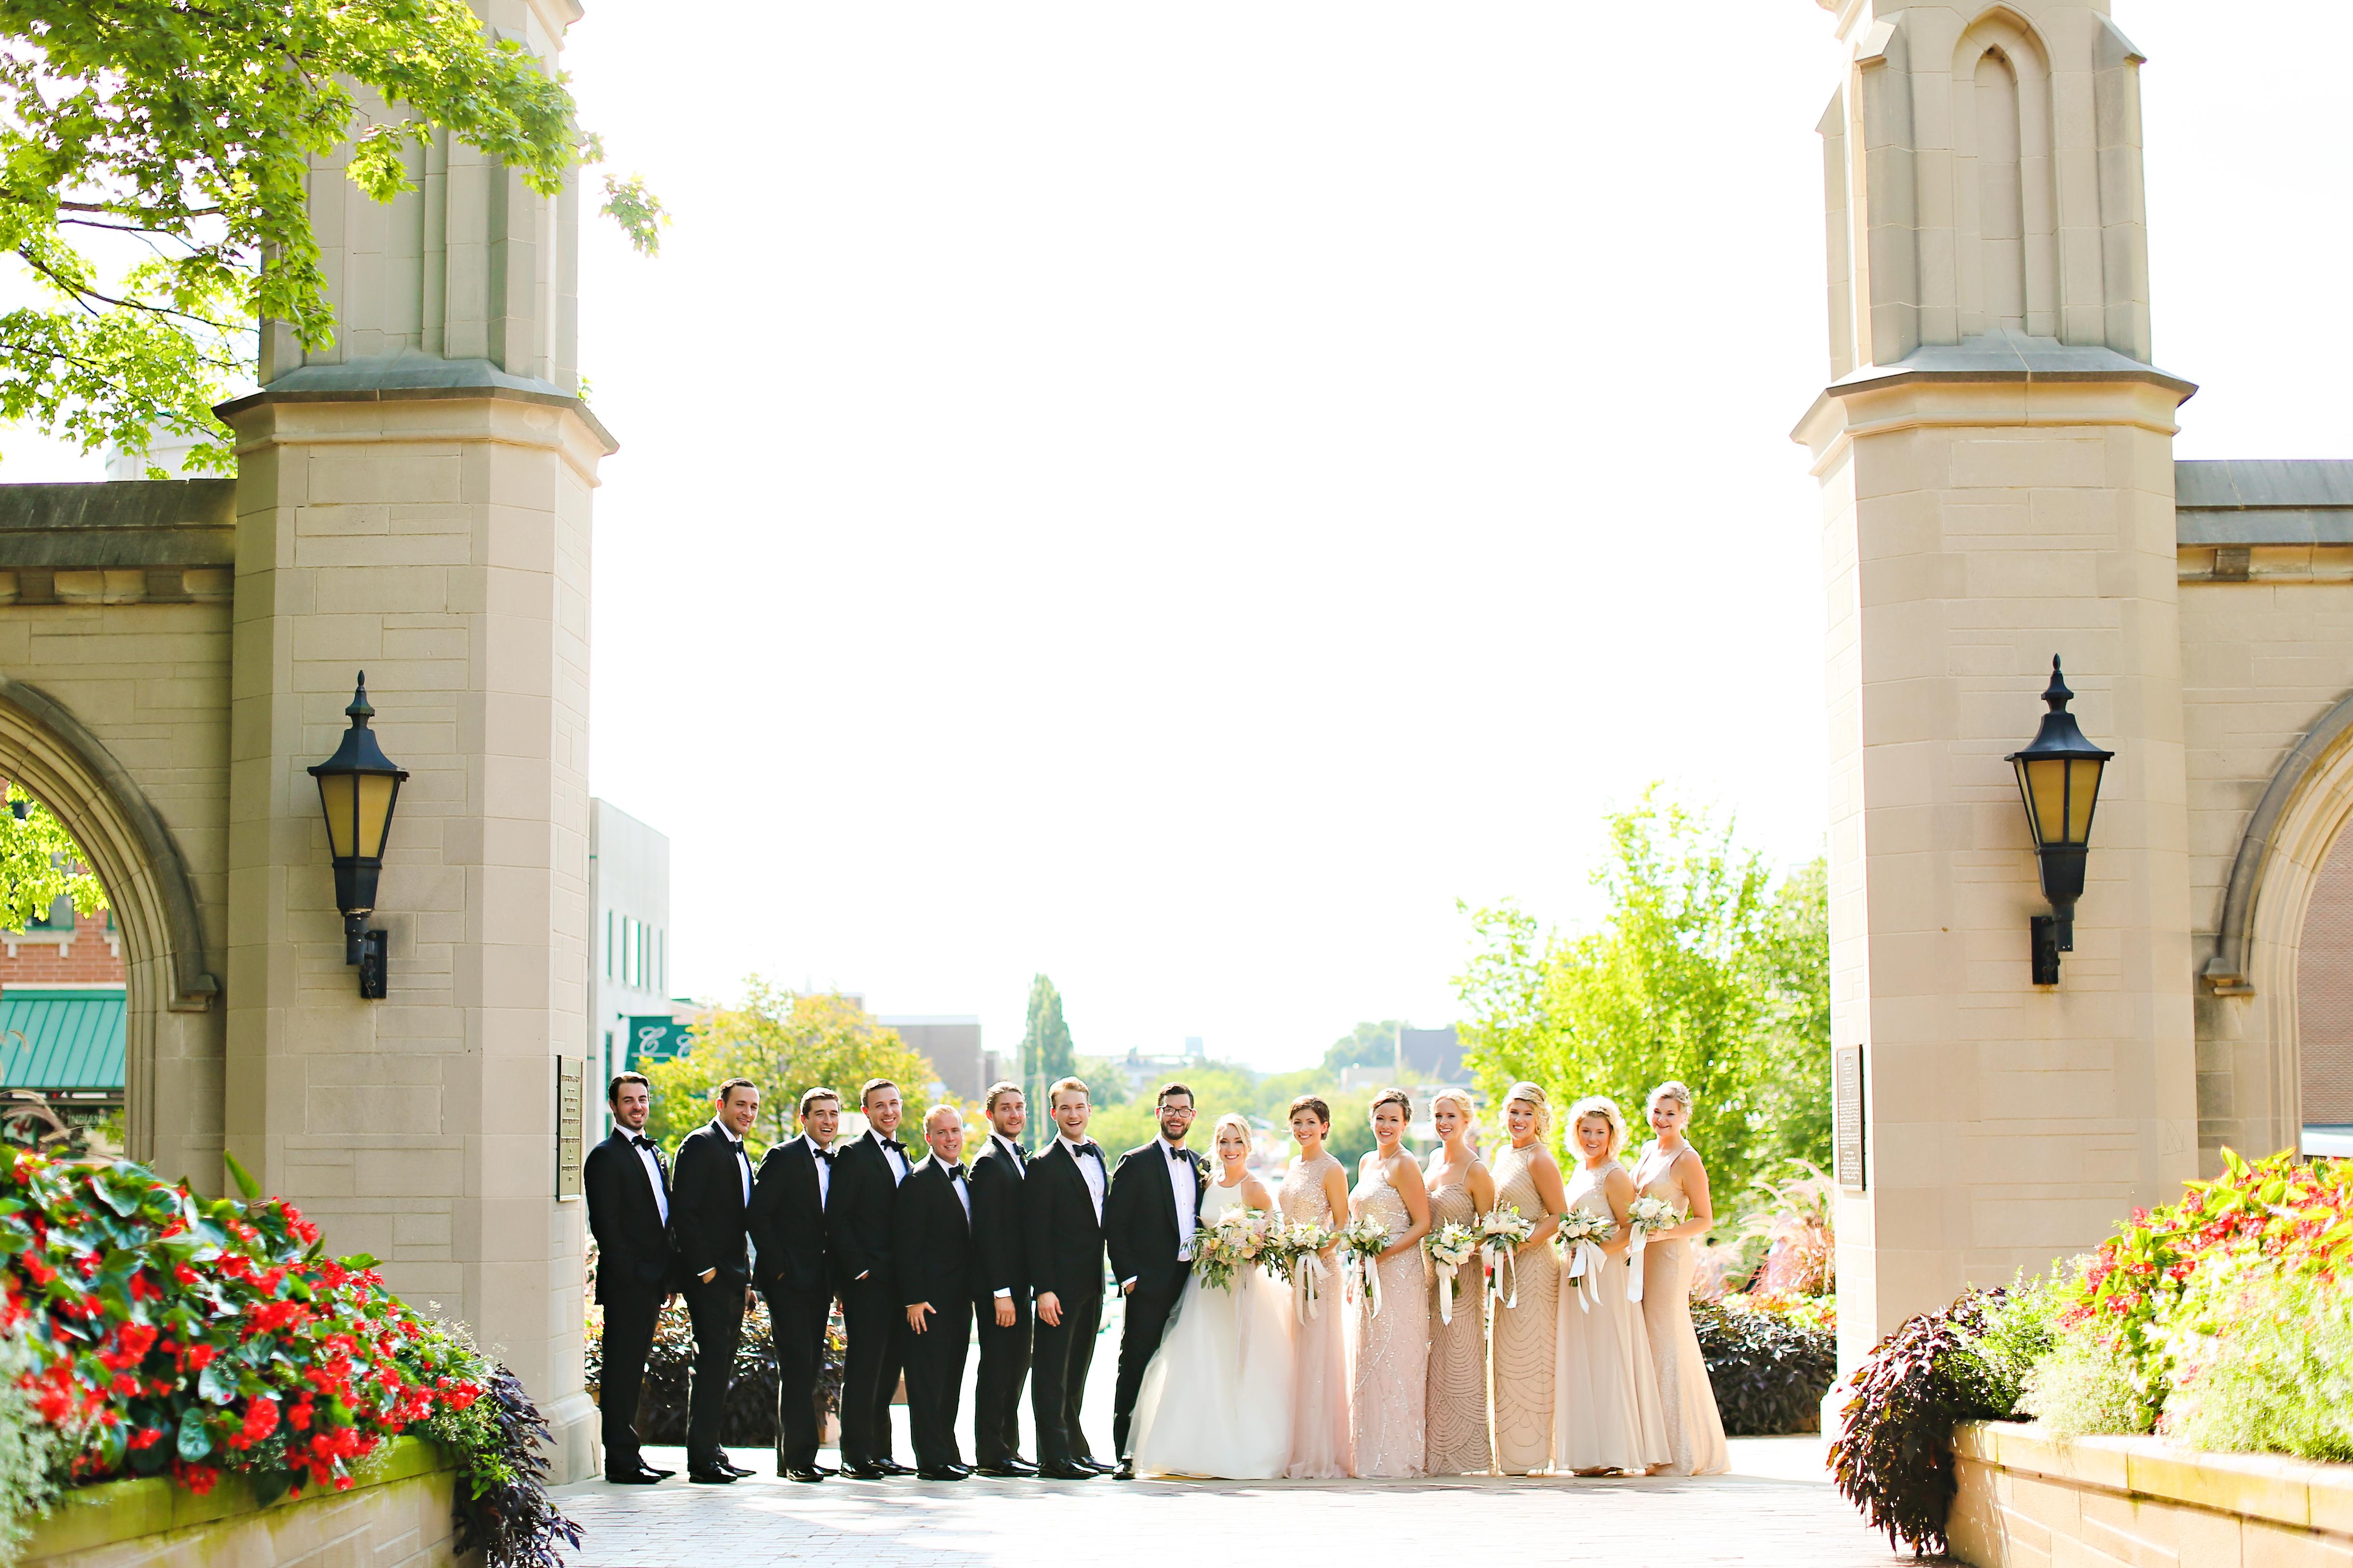 153 meaghan matt indiana university wedding